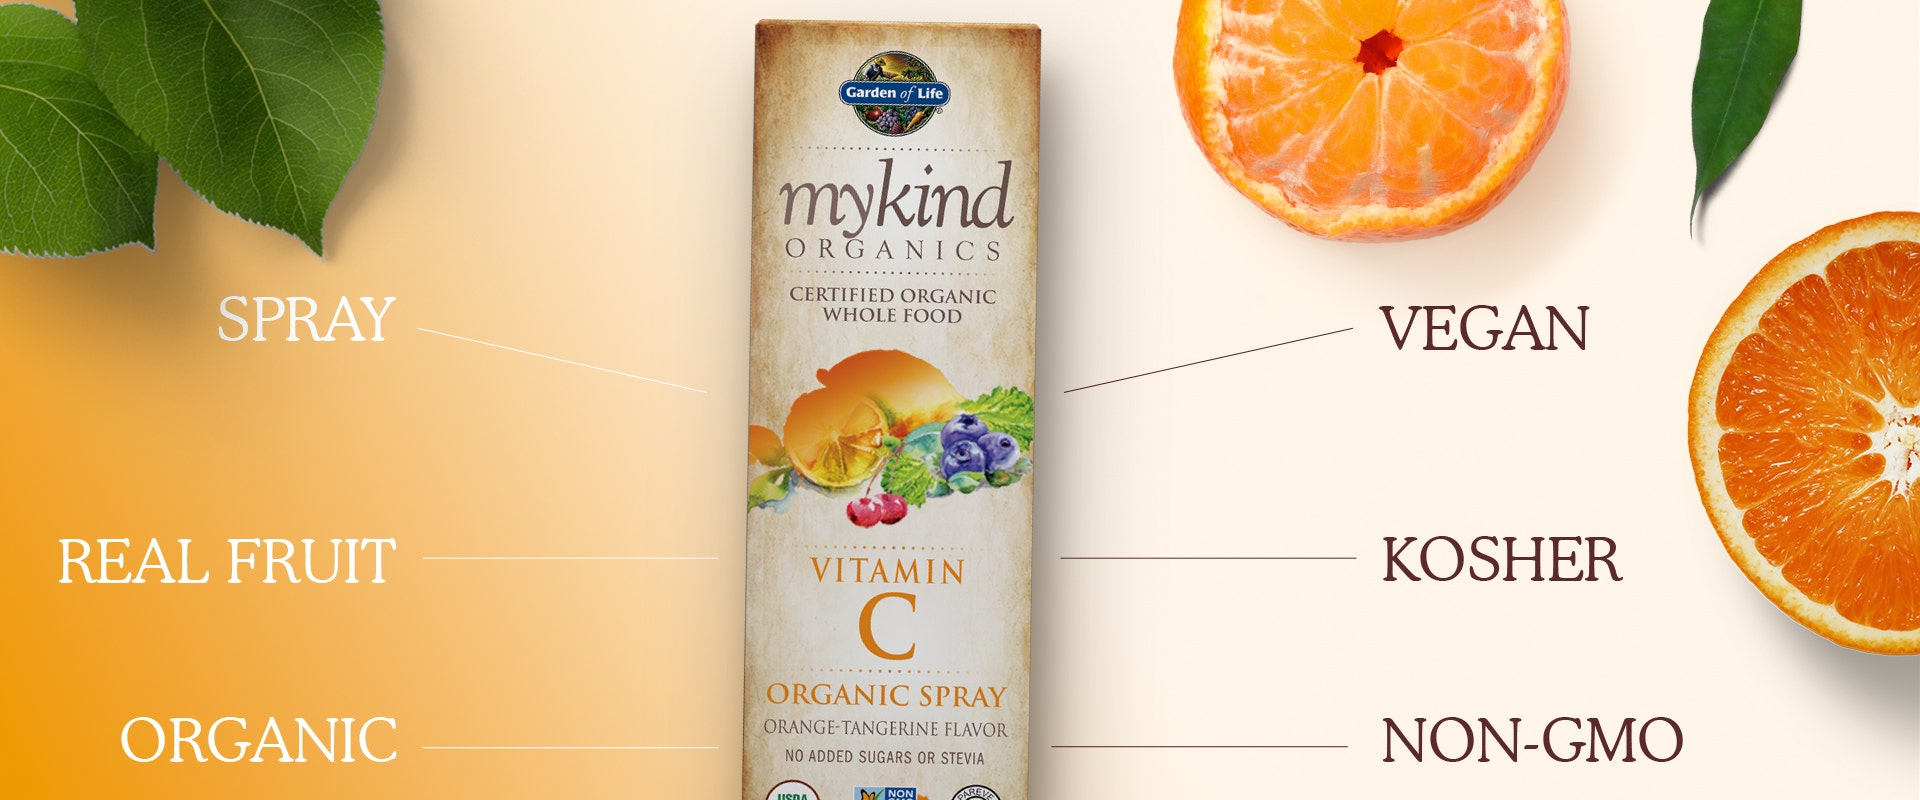 mykind organics vitamin c spray by garden of life